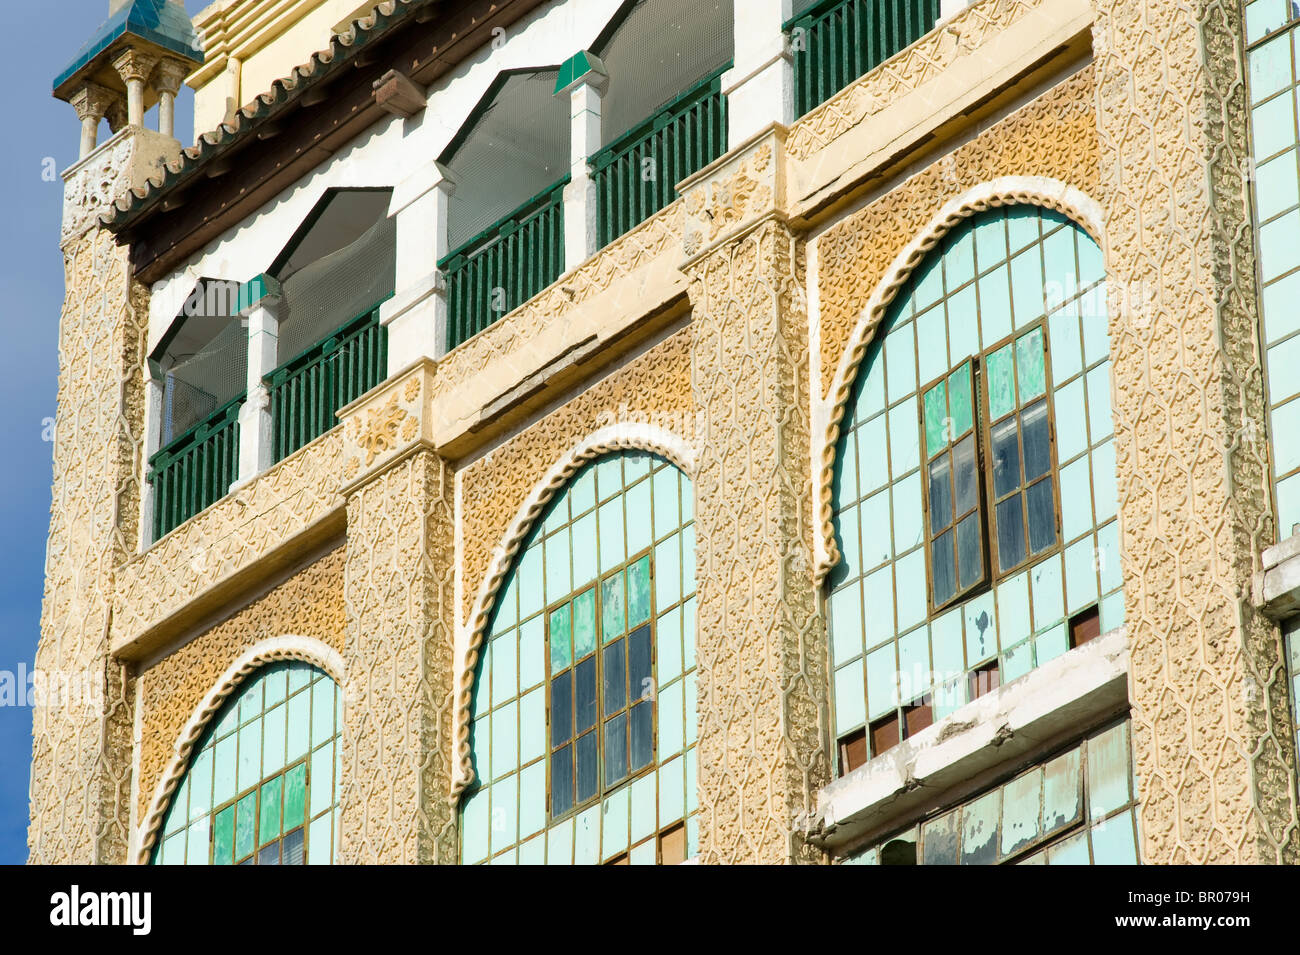 Casa de los Cristales by the Modernist style architect Enrique Nieto . Melilla.Spain. - Stock Image